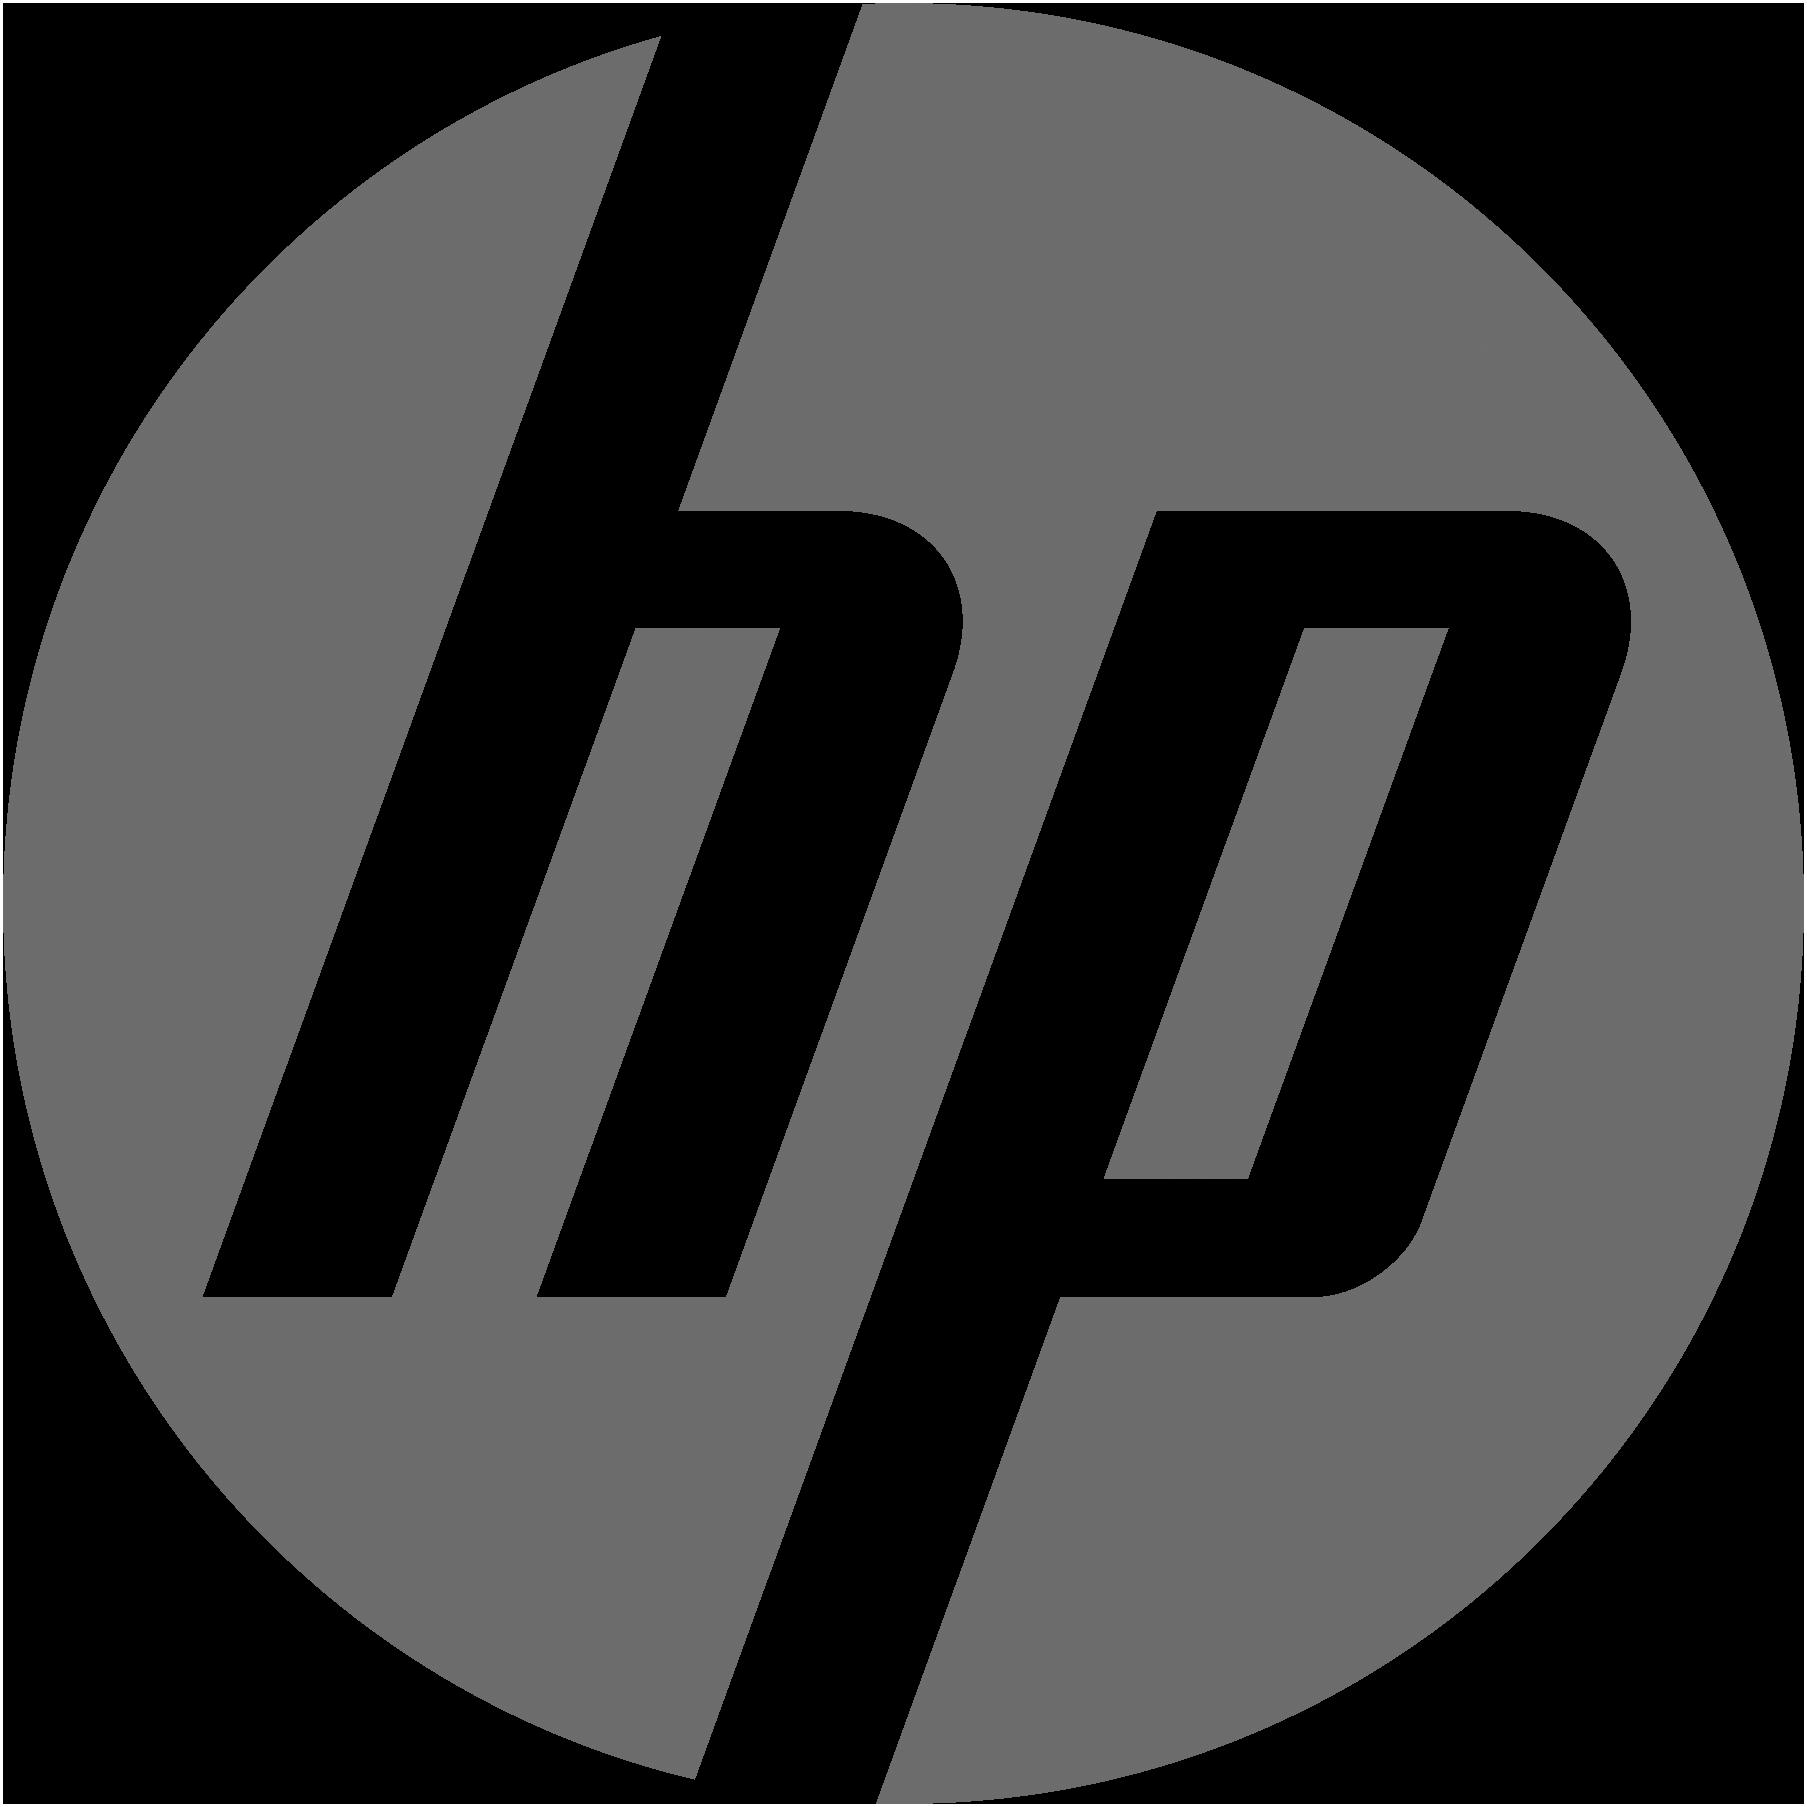 HP_logo_2012_grey.png